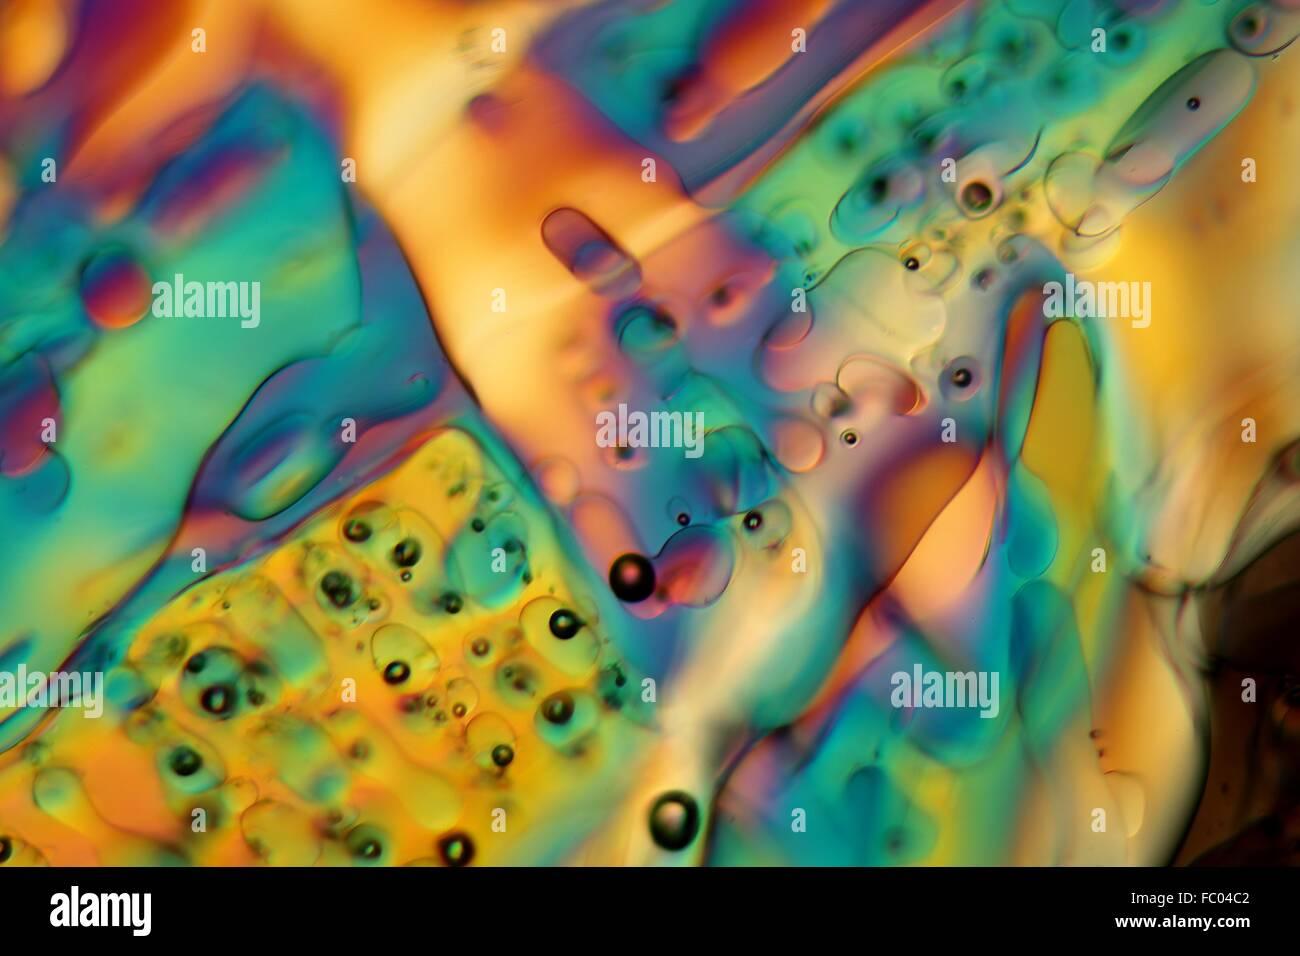 Eiskristalle Im Polarisiertem Licht. Stockbild